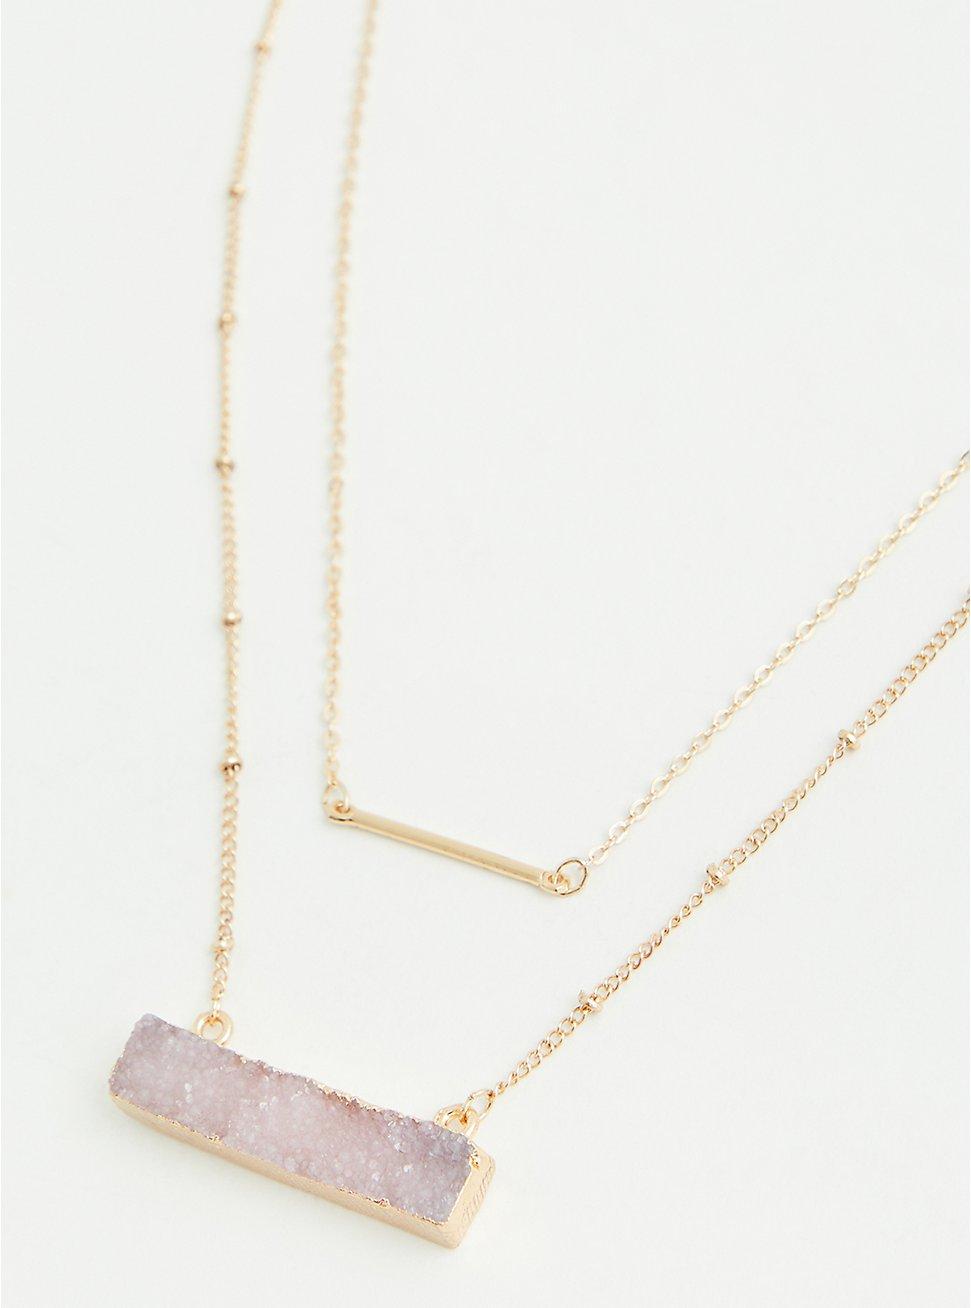 Gold-Tone & Blush Bar Faux Stone Layered Necklace, , hi-res